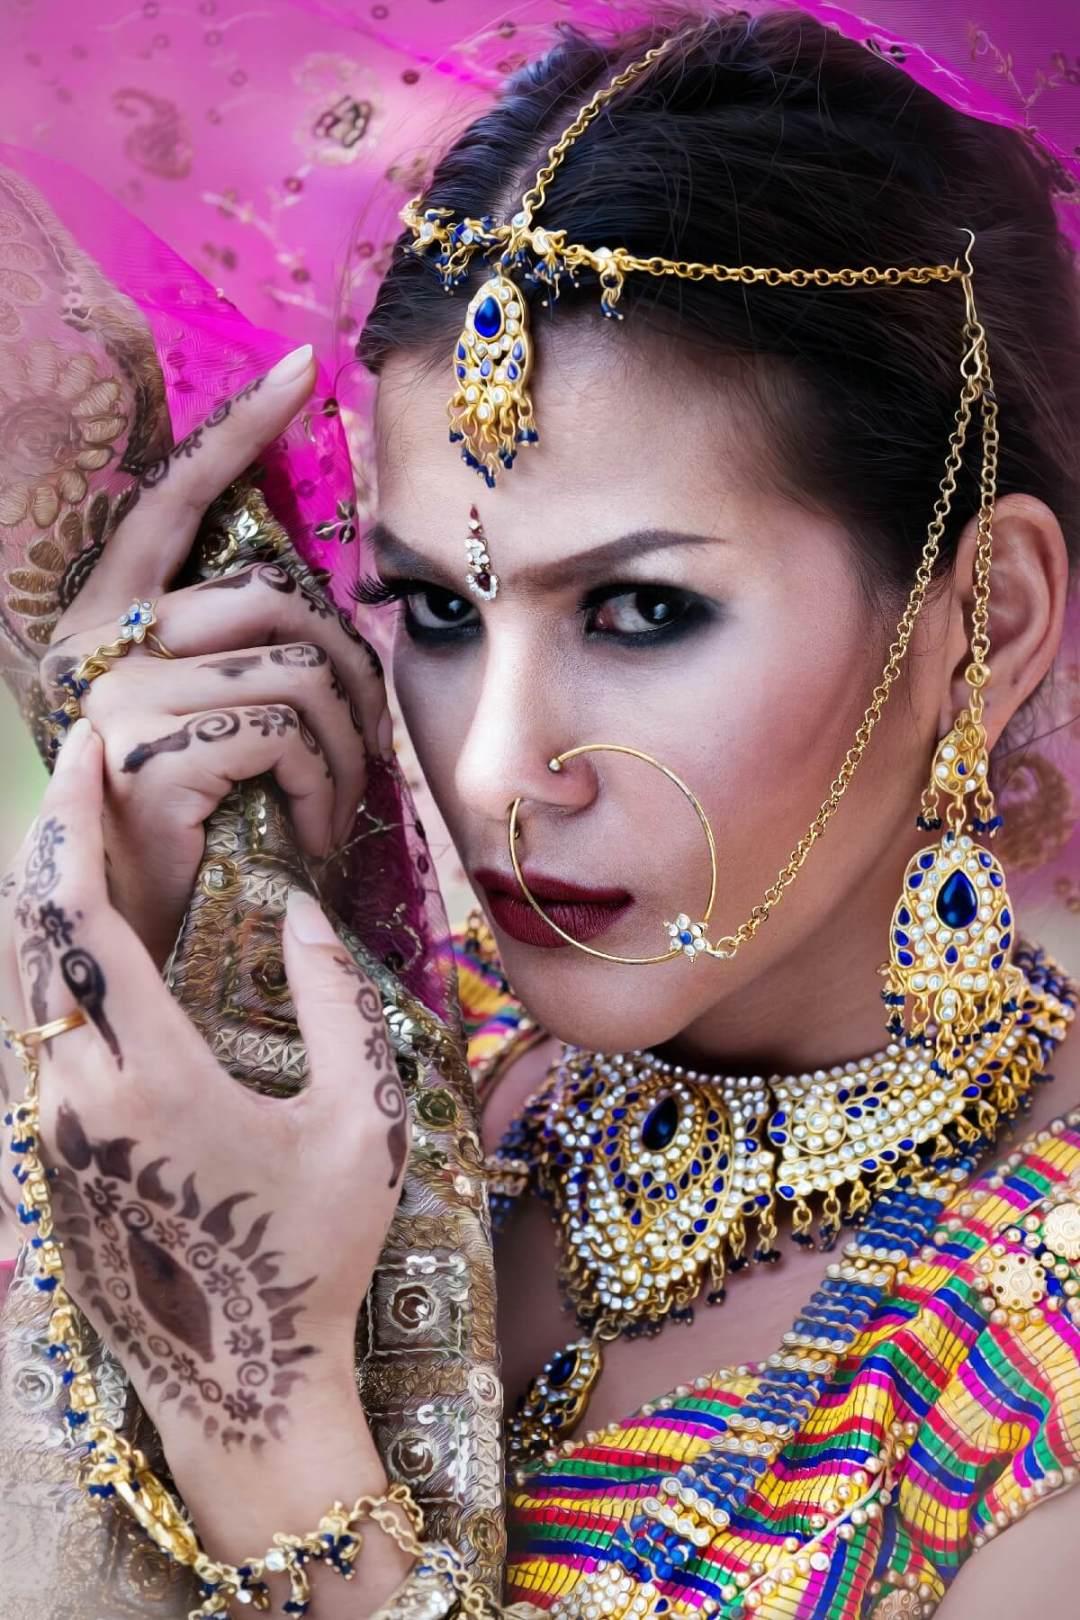 Beautiful Indian Bridal Makeup idea with kundan jewelry